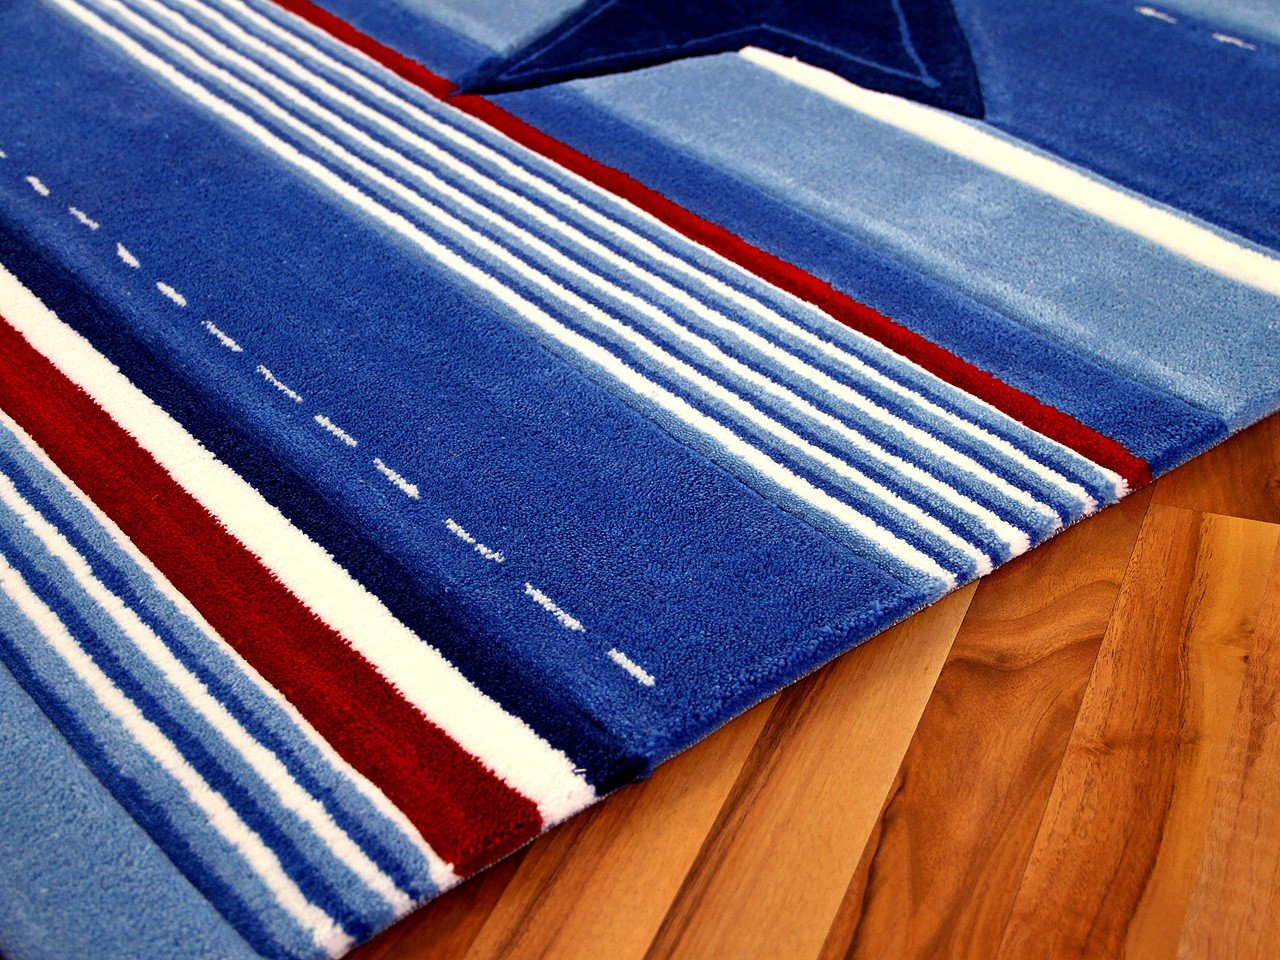 Kinderteppich blau stern  Amazon.de: Lifestyle Kinderteppich Blau Stern in 3 Größen ...